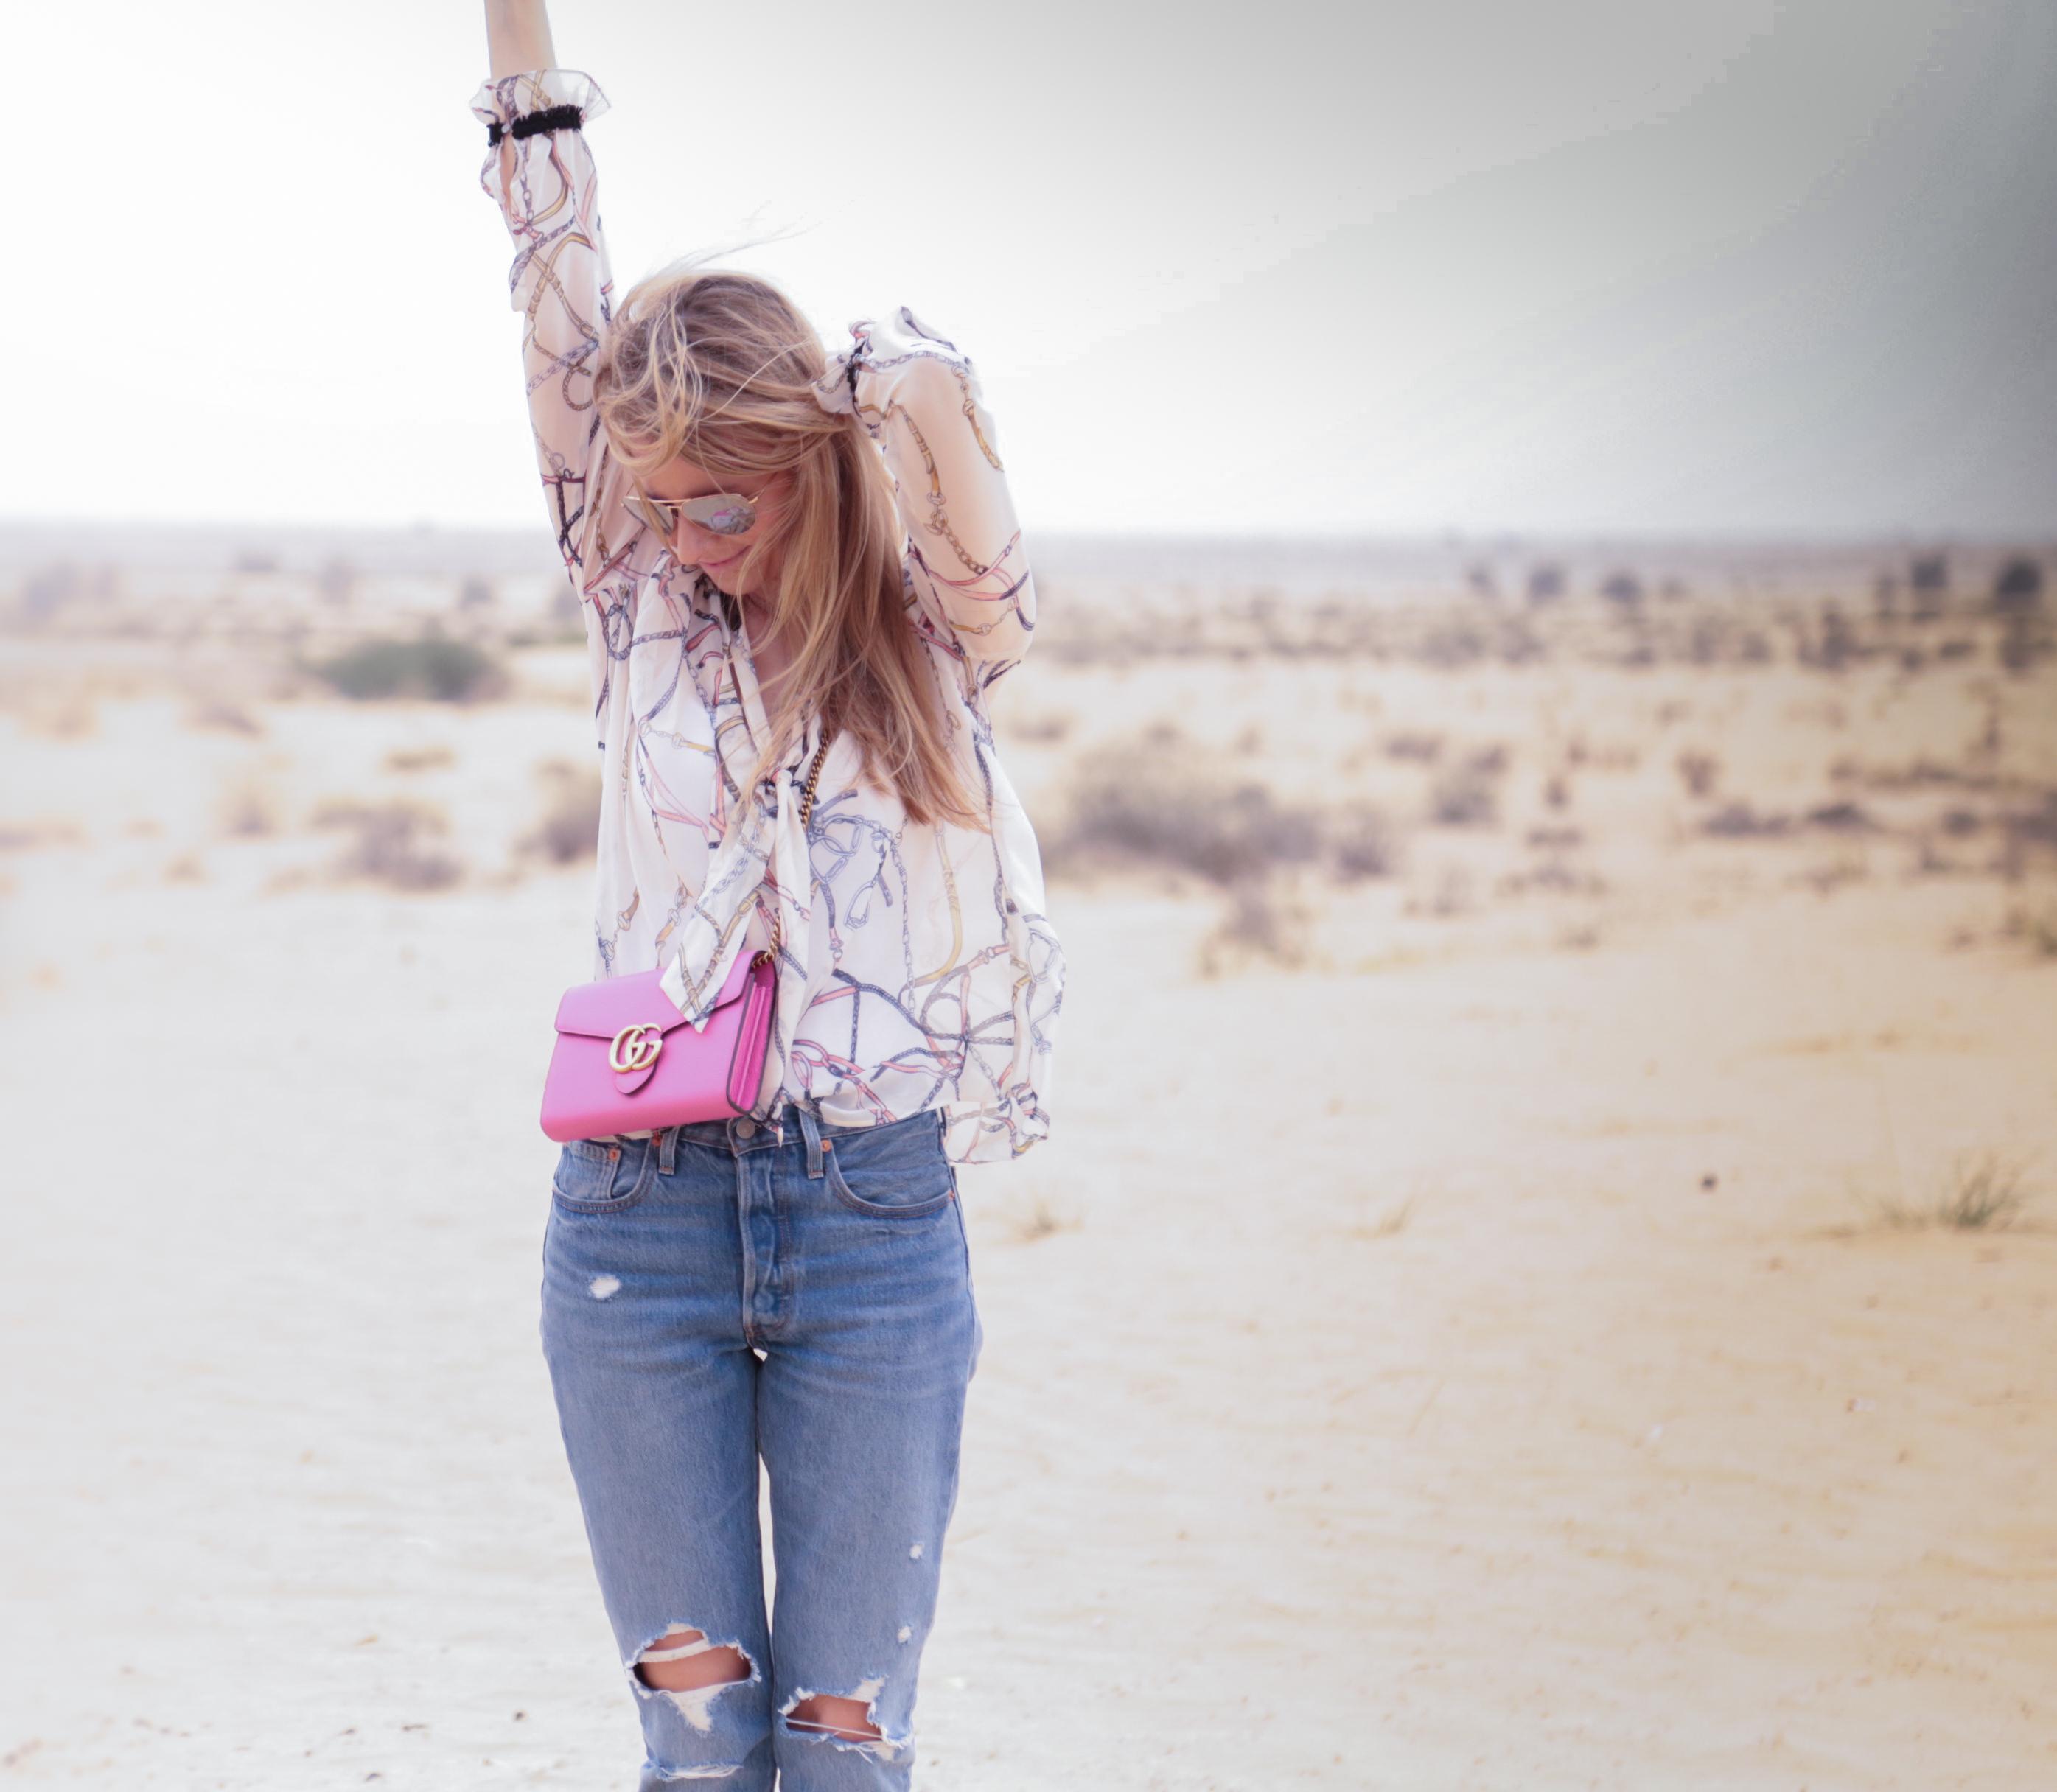 10 Facts about me Jeans Denim Fakten Jennifer PepperAndGold Gucci Zara Levis SkinnyJeans Wüste Desert Hotel Dubai StanSmith Adidas